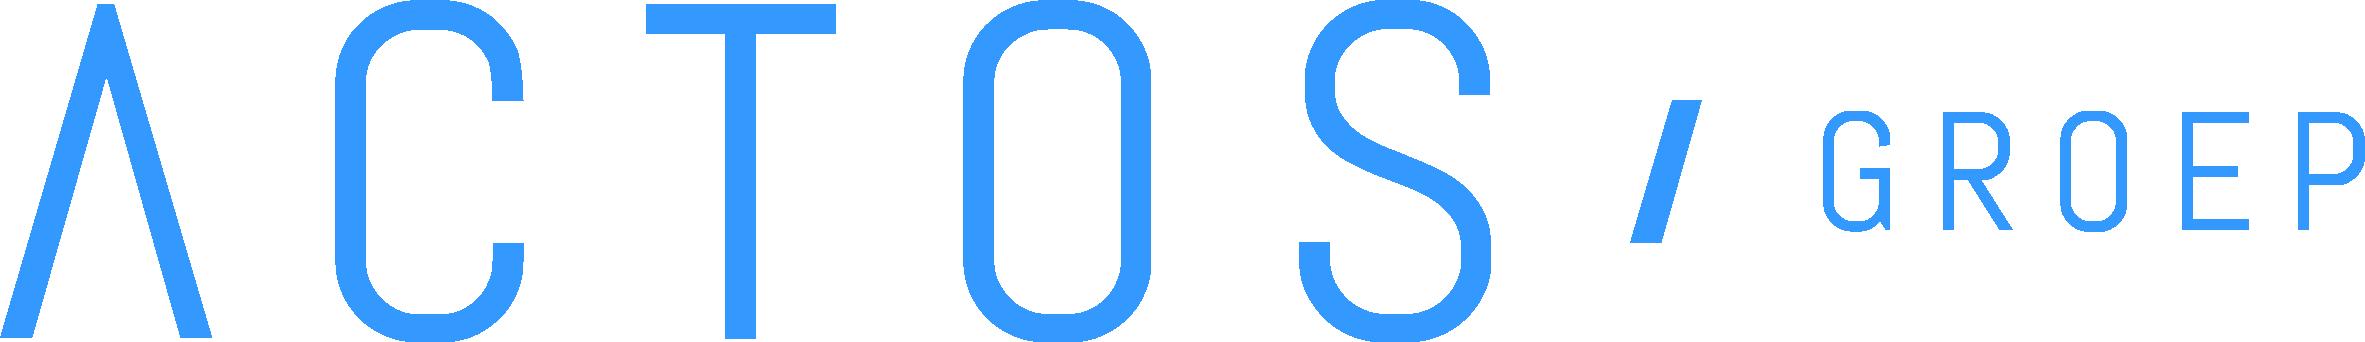 Actos Groep Logo Blue Wo Box